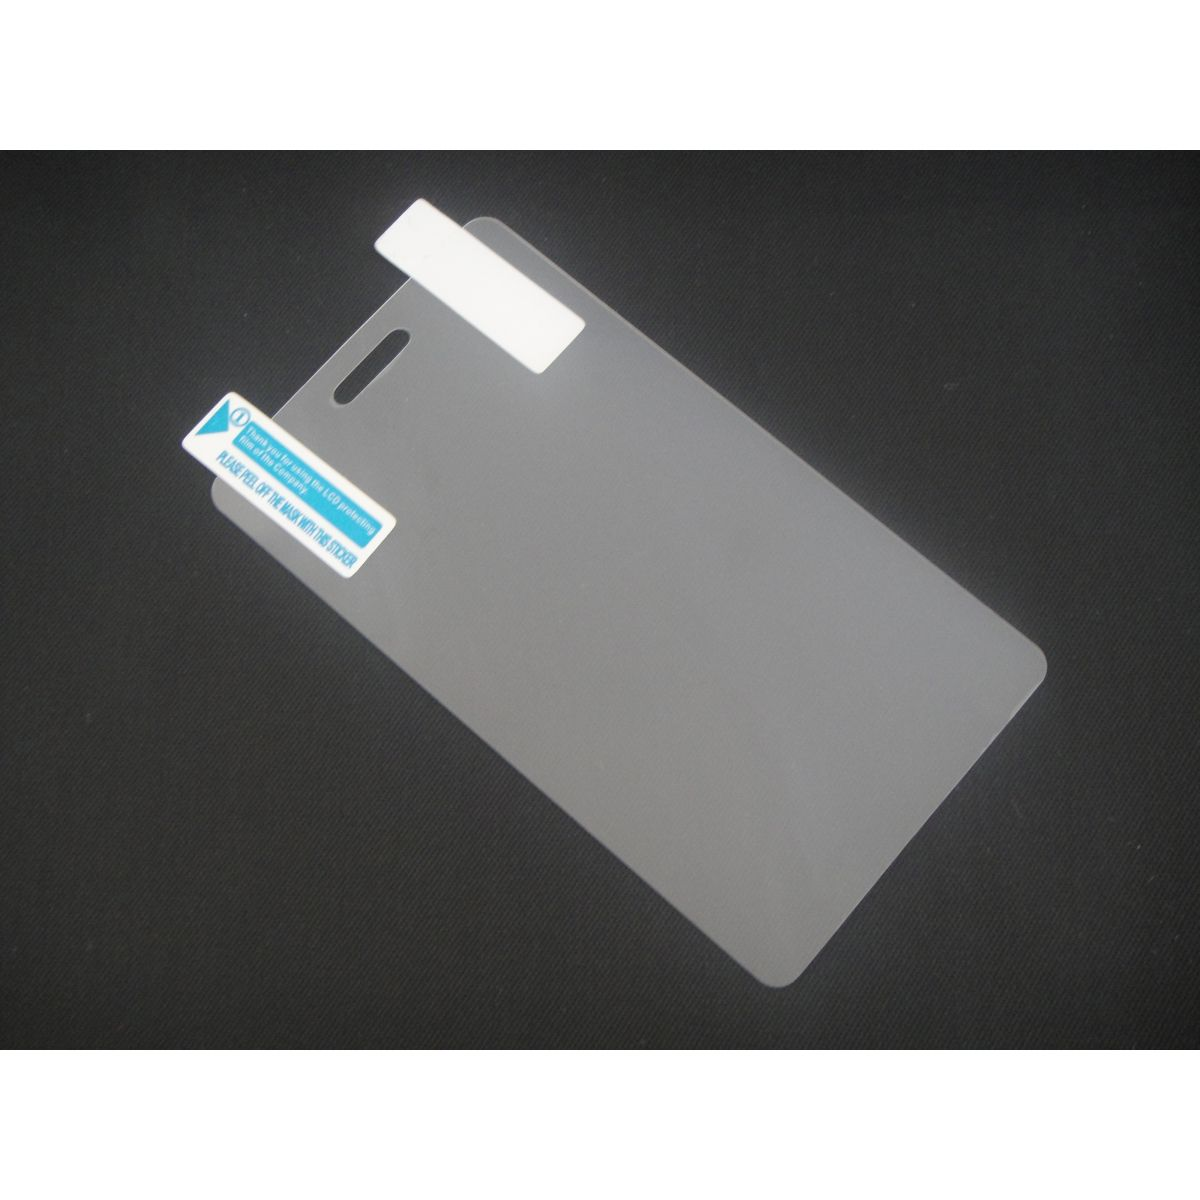 Pelicula Protetora para LG T375 Cookie Smart Fosca